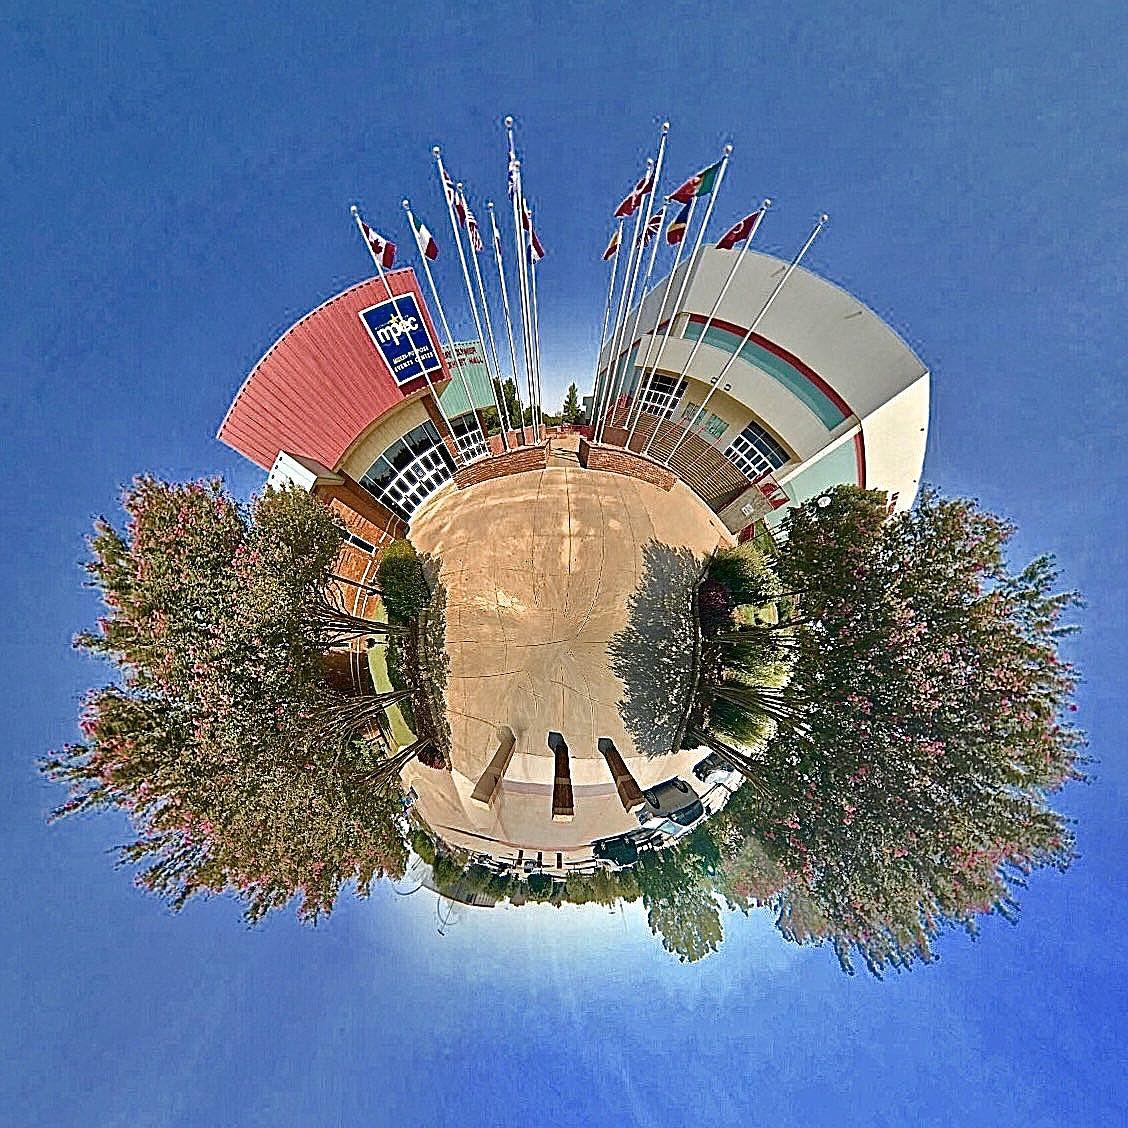 MPEC-Coliseum - Tiny Planet